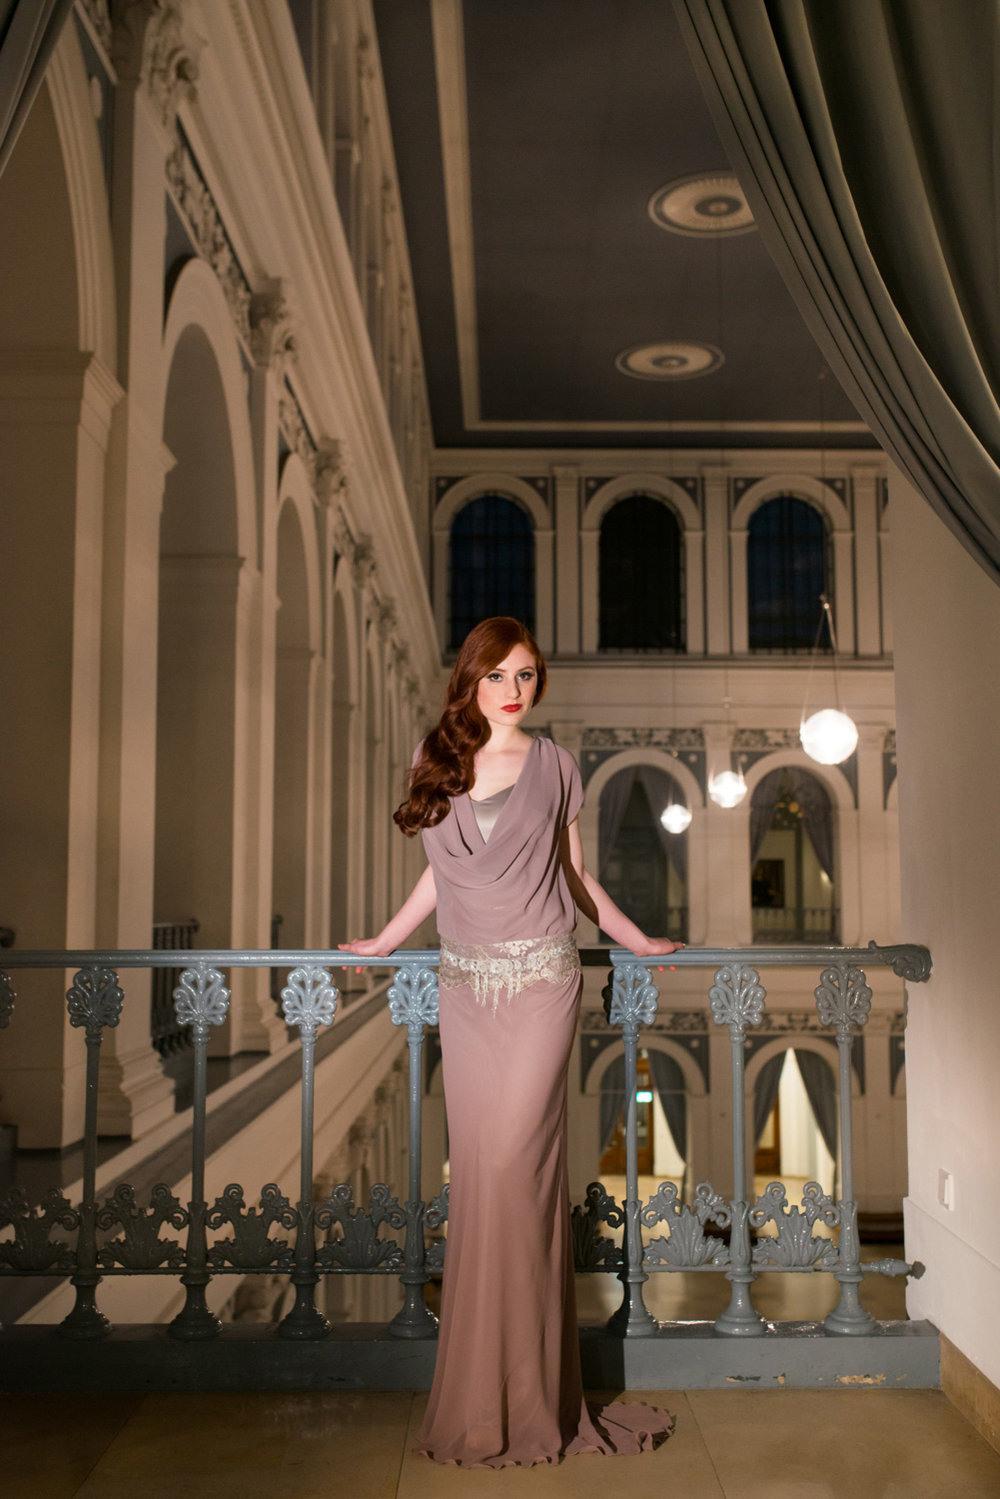 17 Genial Abend Kleid In Hamburg Vertrieb20 Spektakulär Abend Kleid In Hamburg Vertrieb